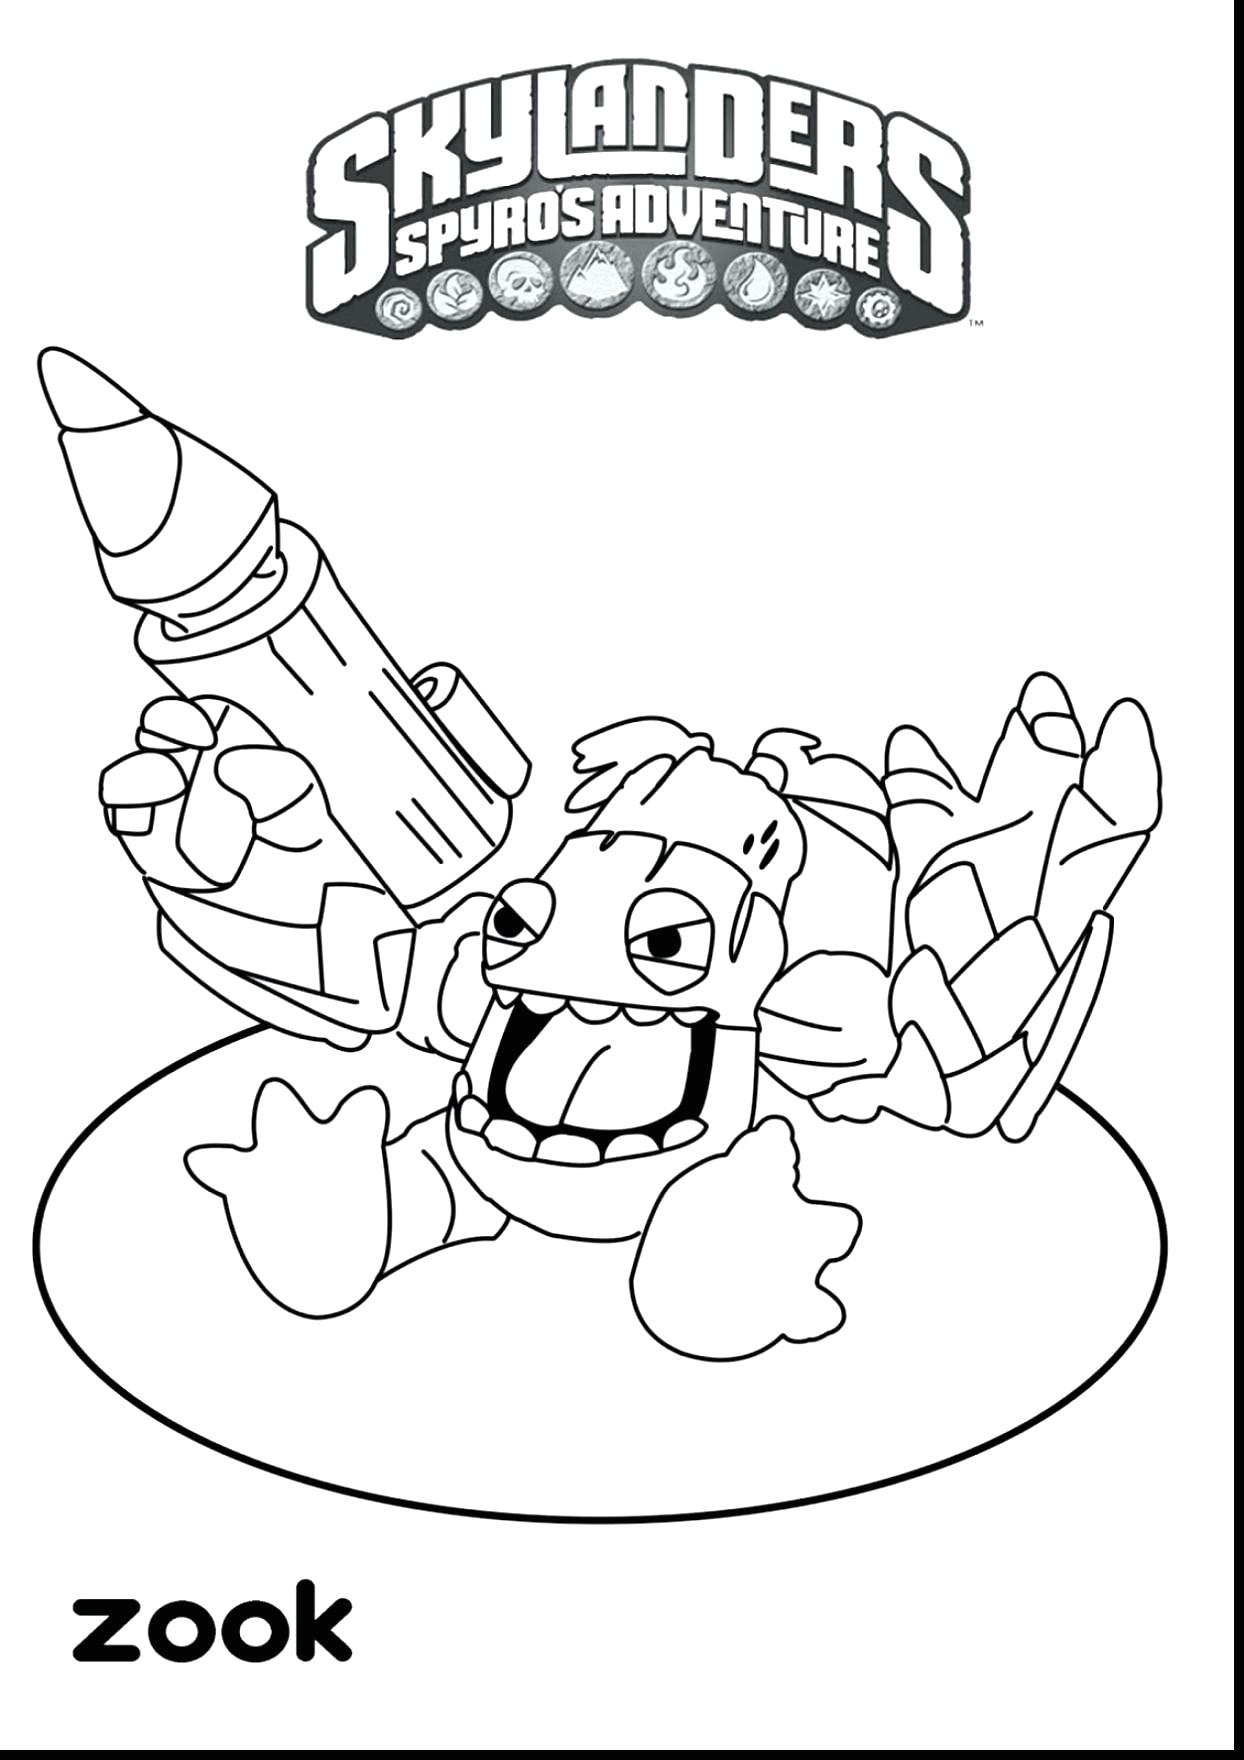 joli coloriage de dragon with site coloriage elegant ghostbusters coloriages 0d free coloring